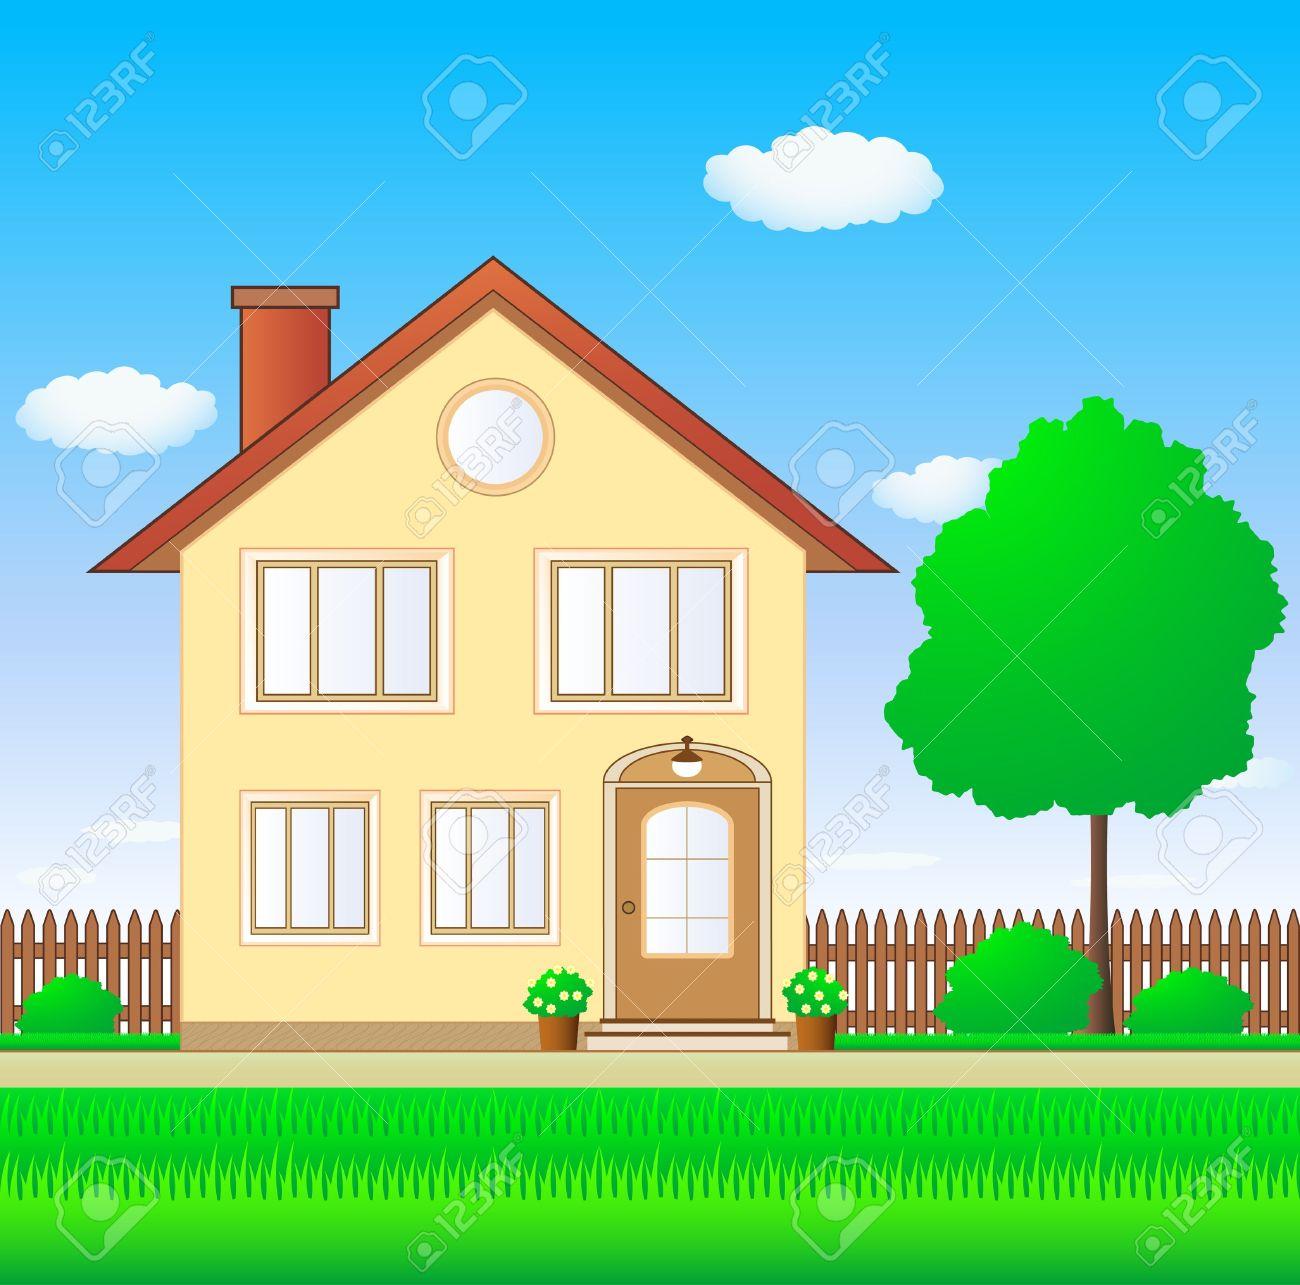 Free editable home and garden clipart.